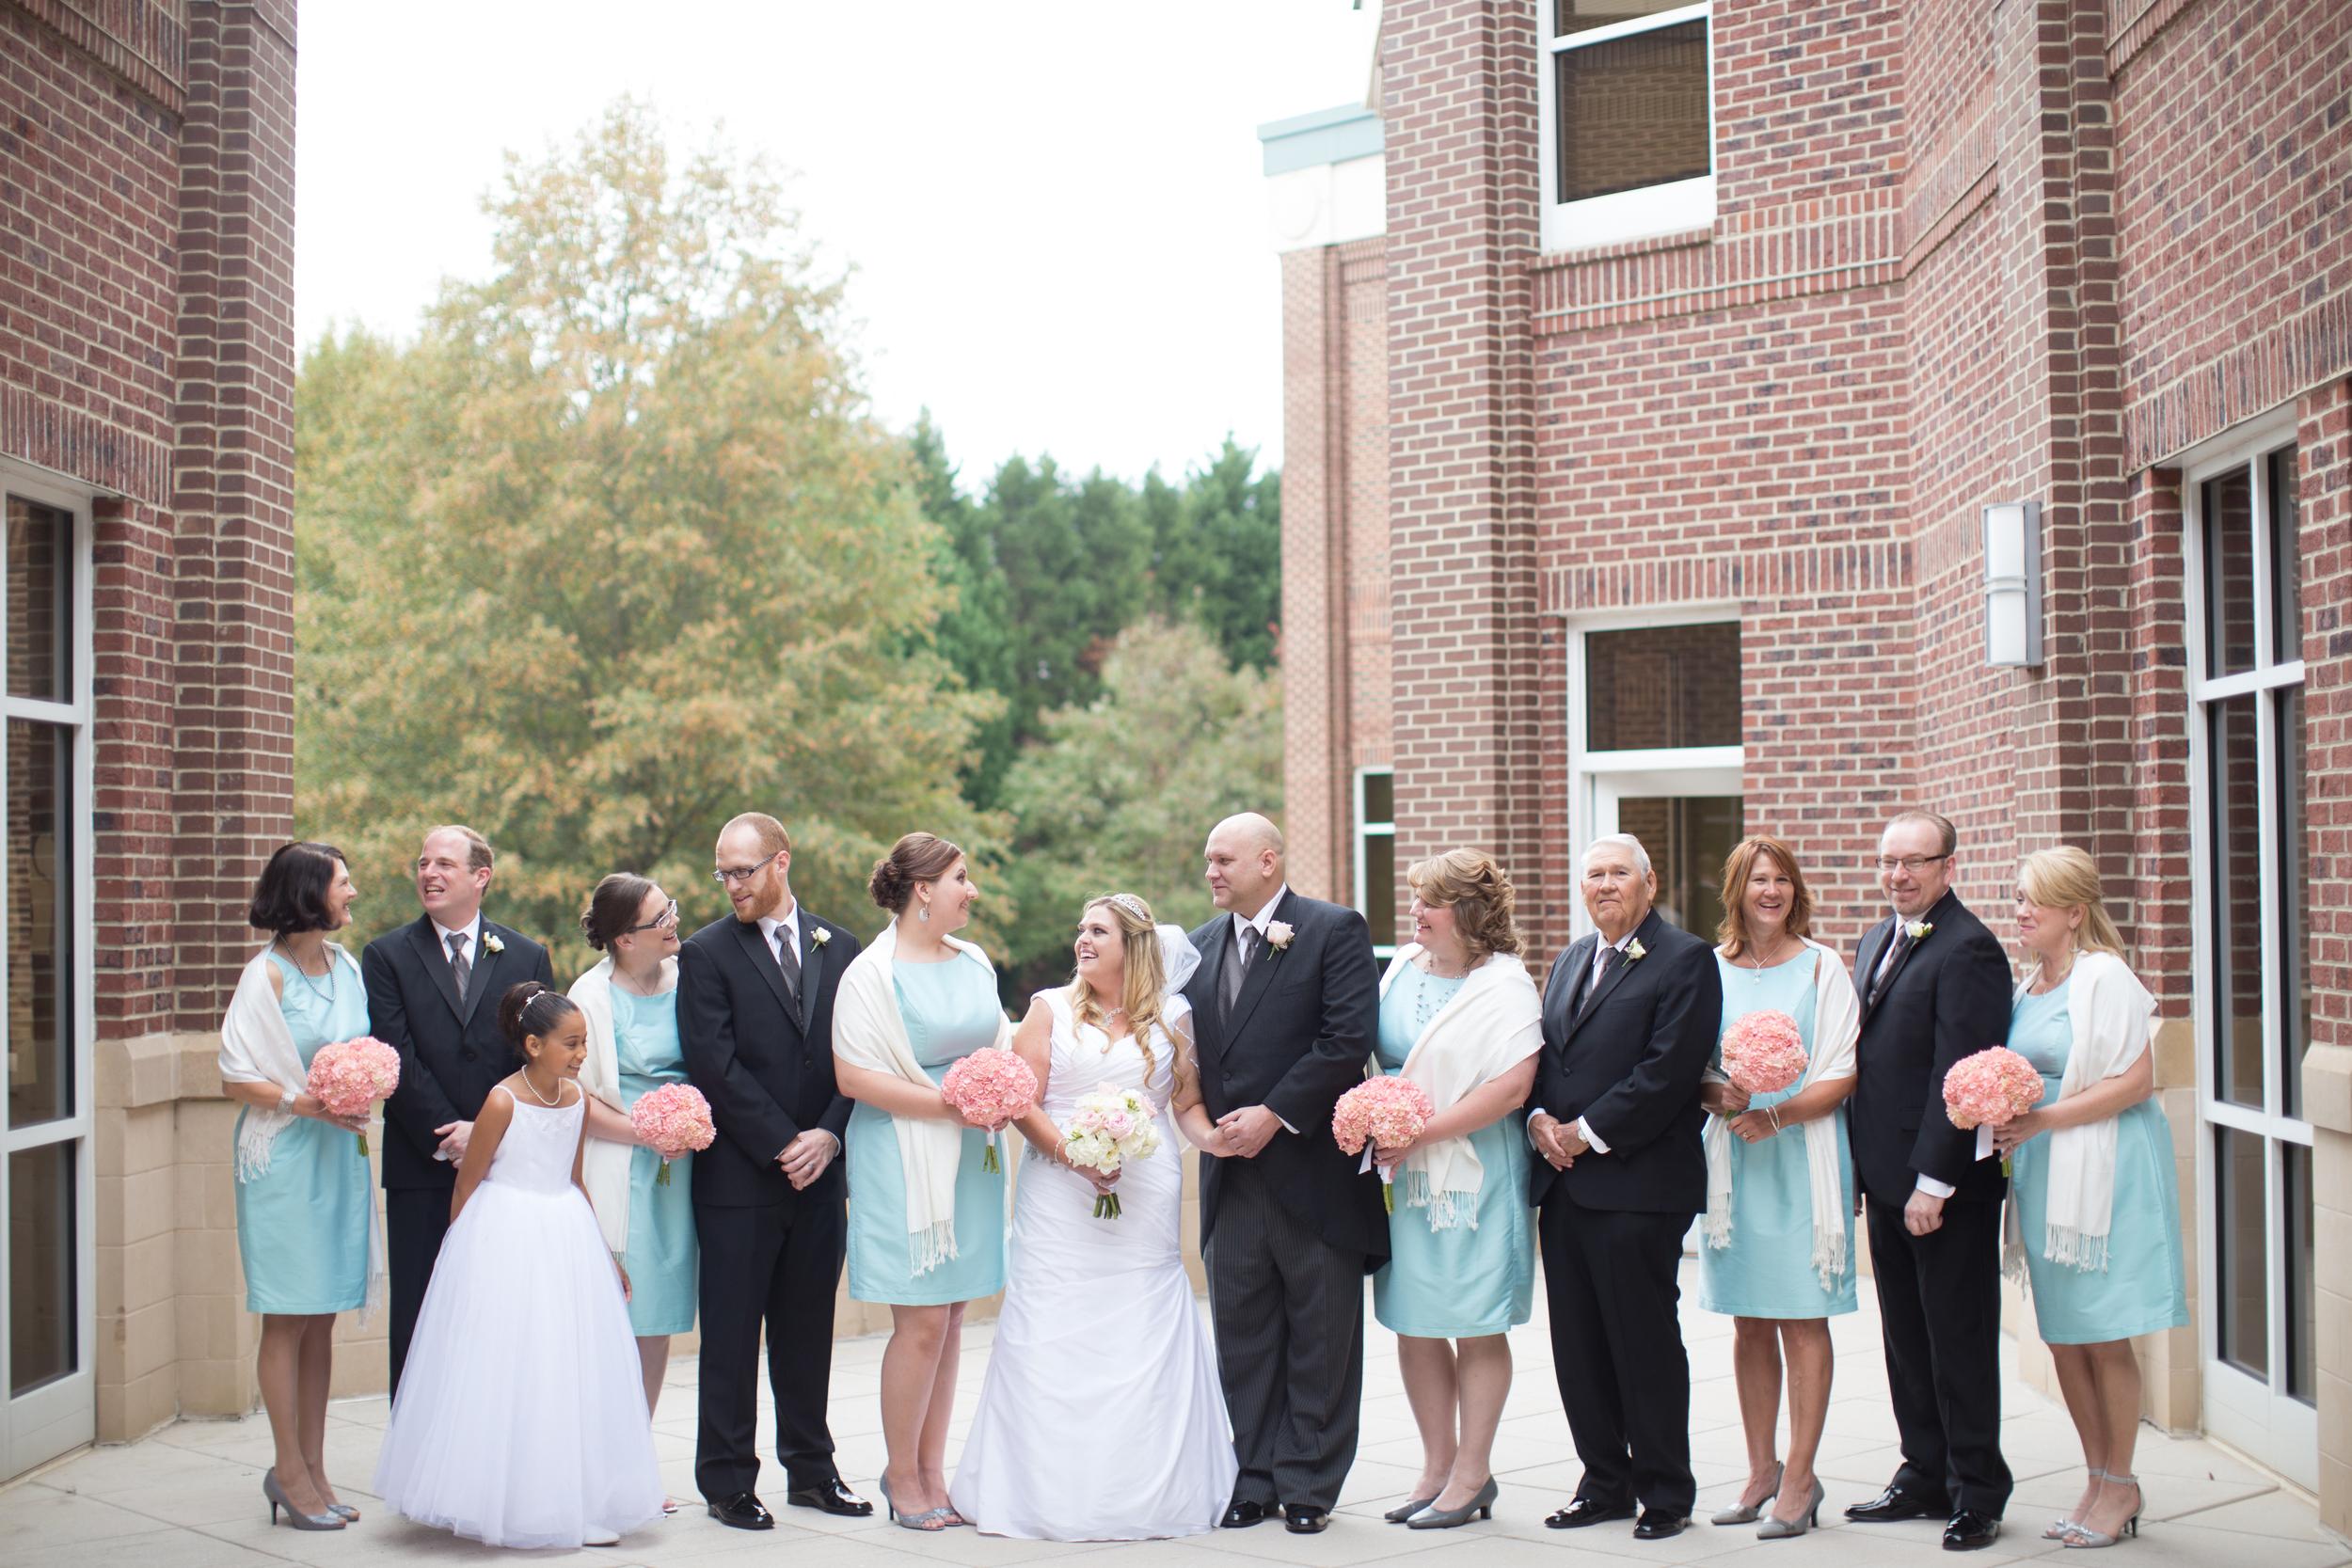 Hough_Wedding_North_Carolina_Charlotte_JonCourvillePhotography-342.jpg